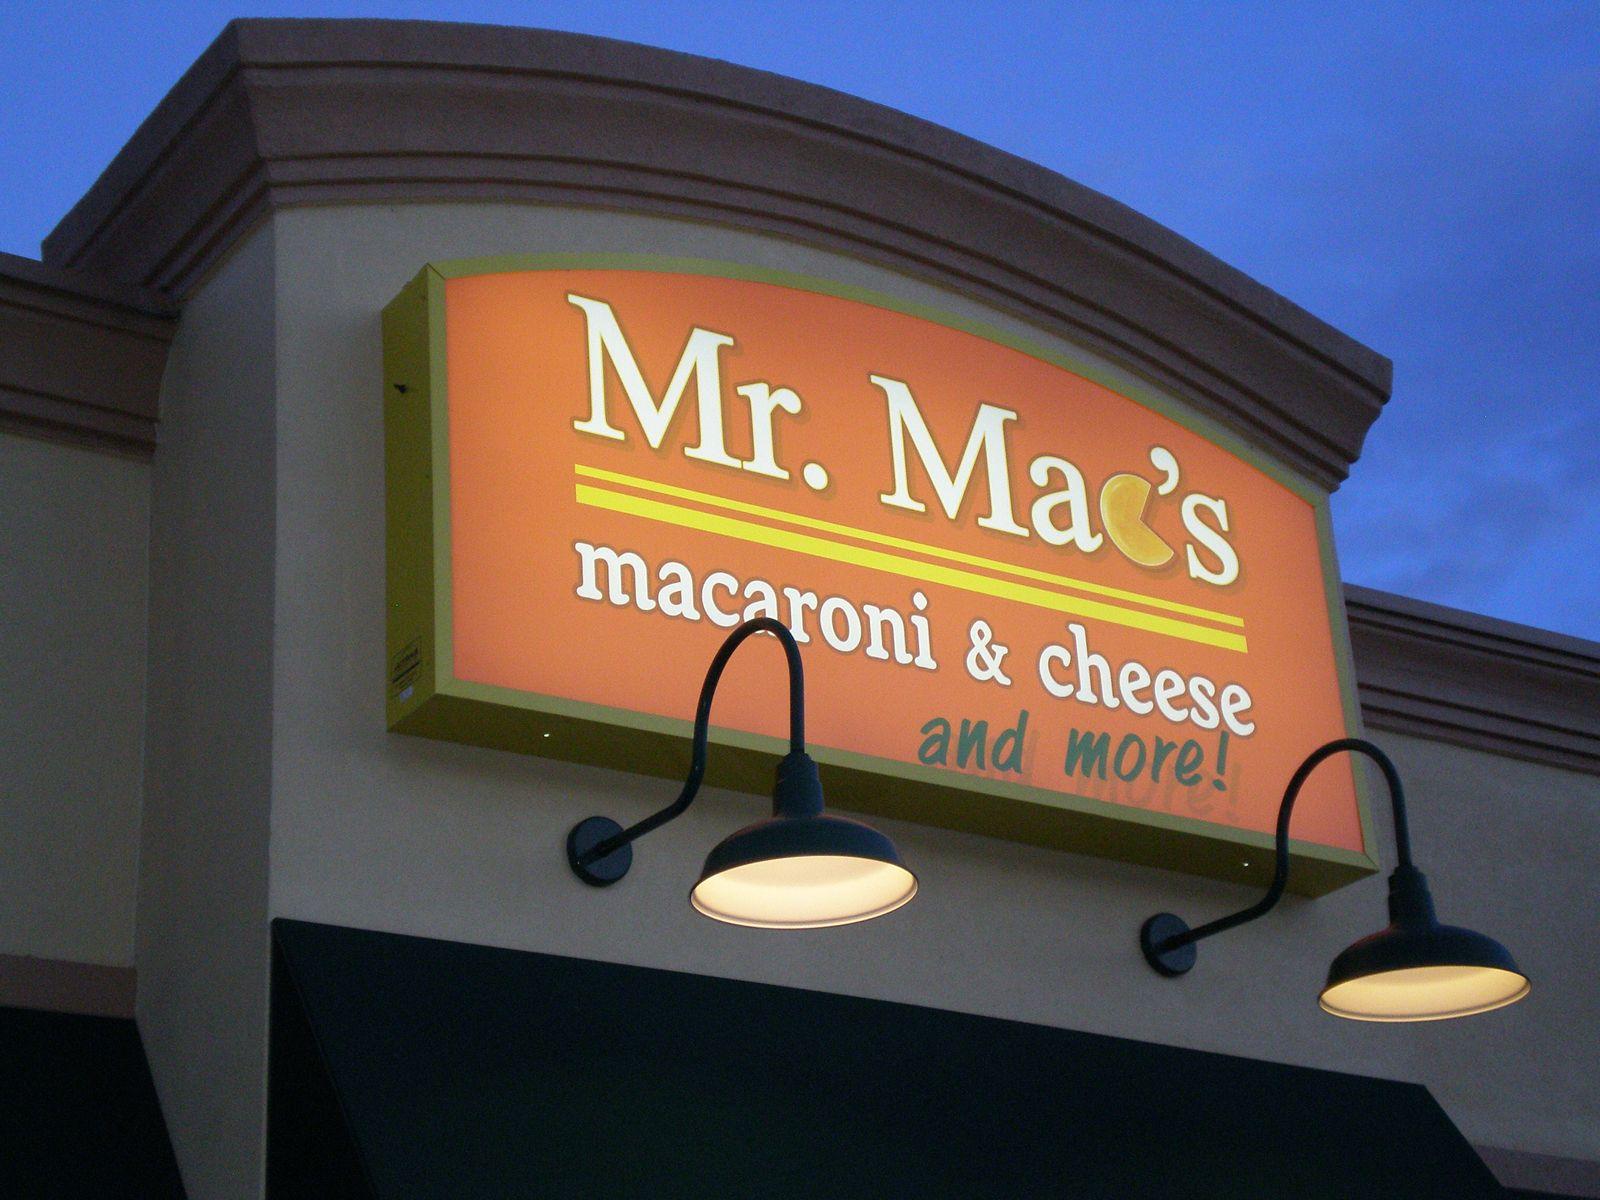 Mr. Mac's Macaroni & Cheese Announces New Restaurant in Massachusetts